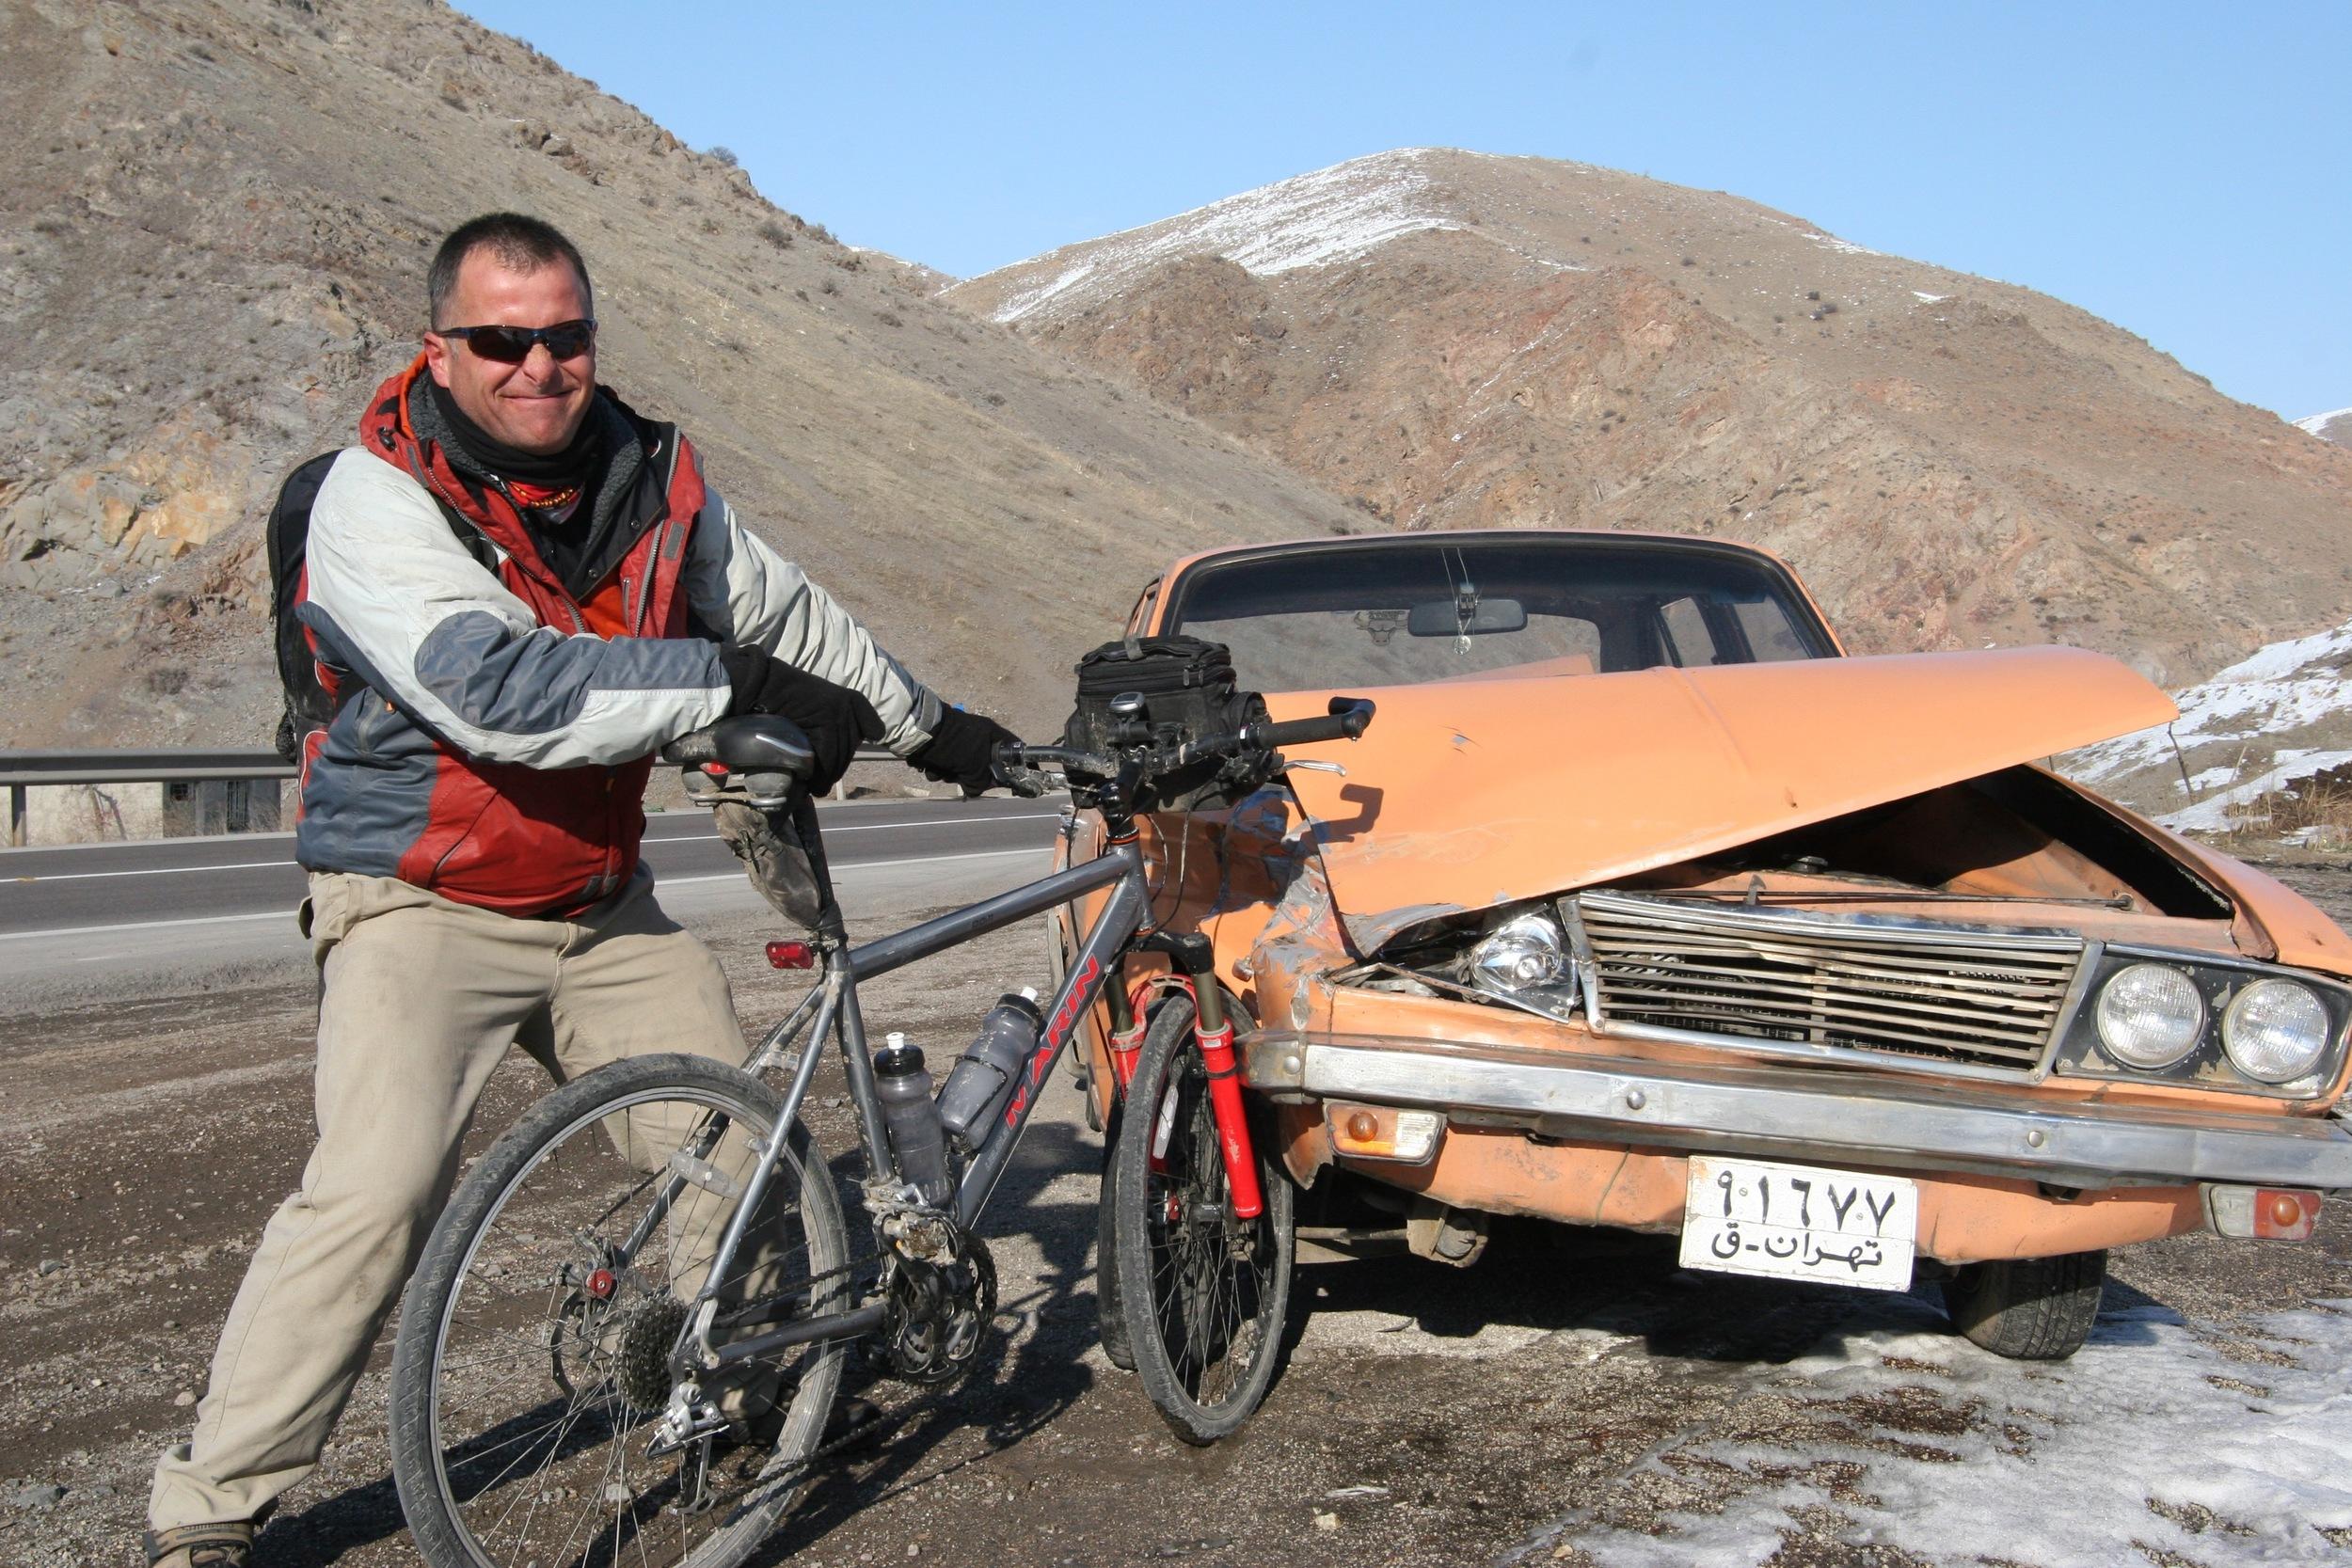 Car wreckage is a regular sight in Iran